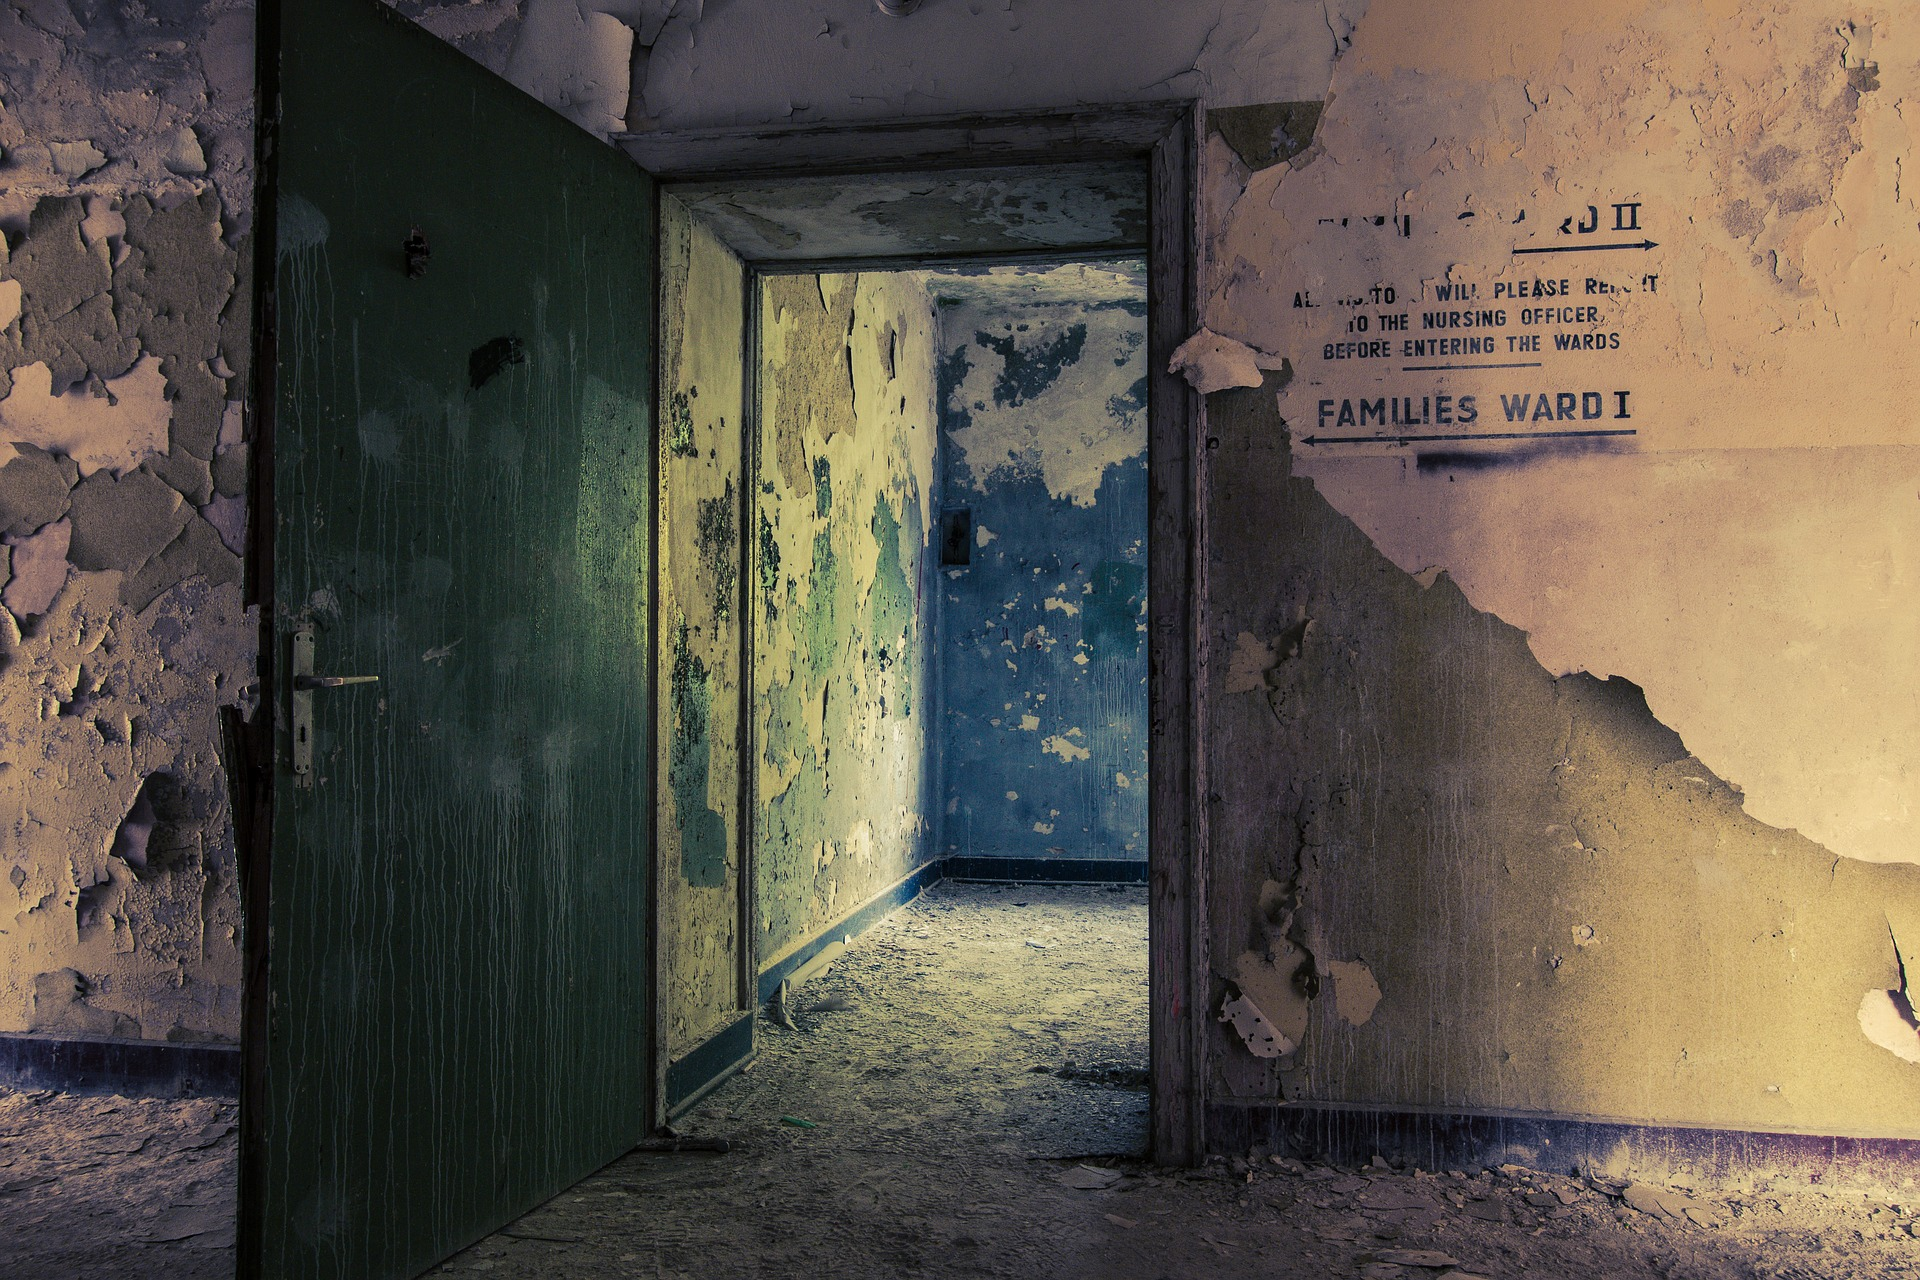 hospital-1650101_1920.jpg